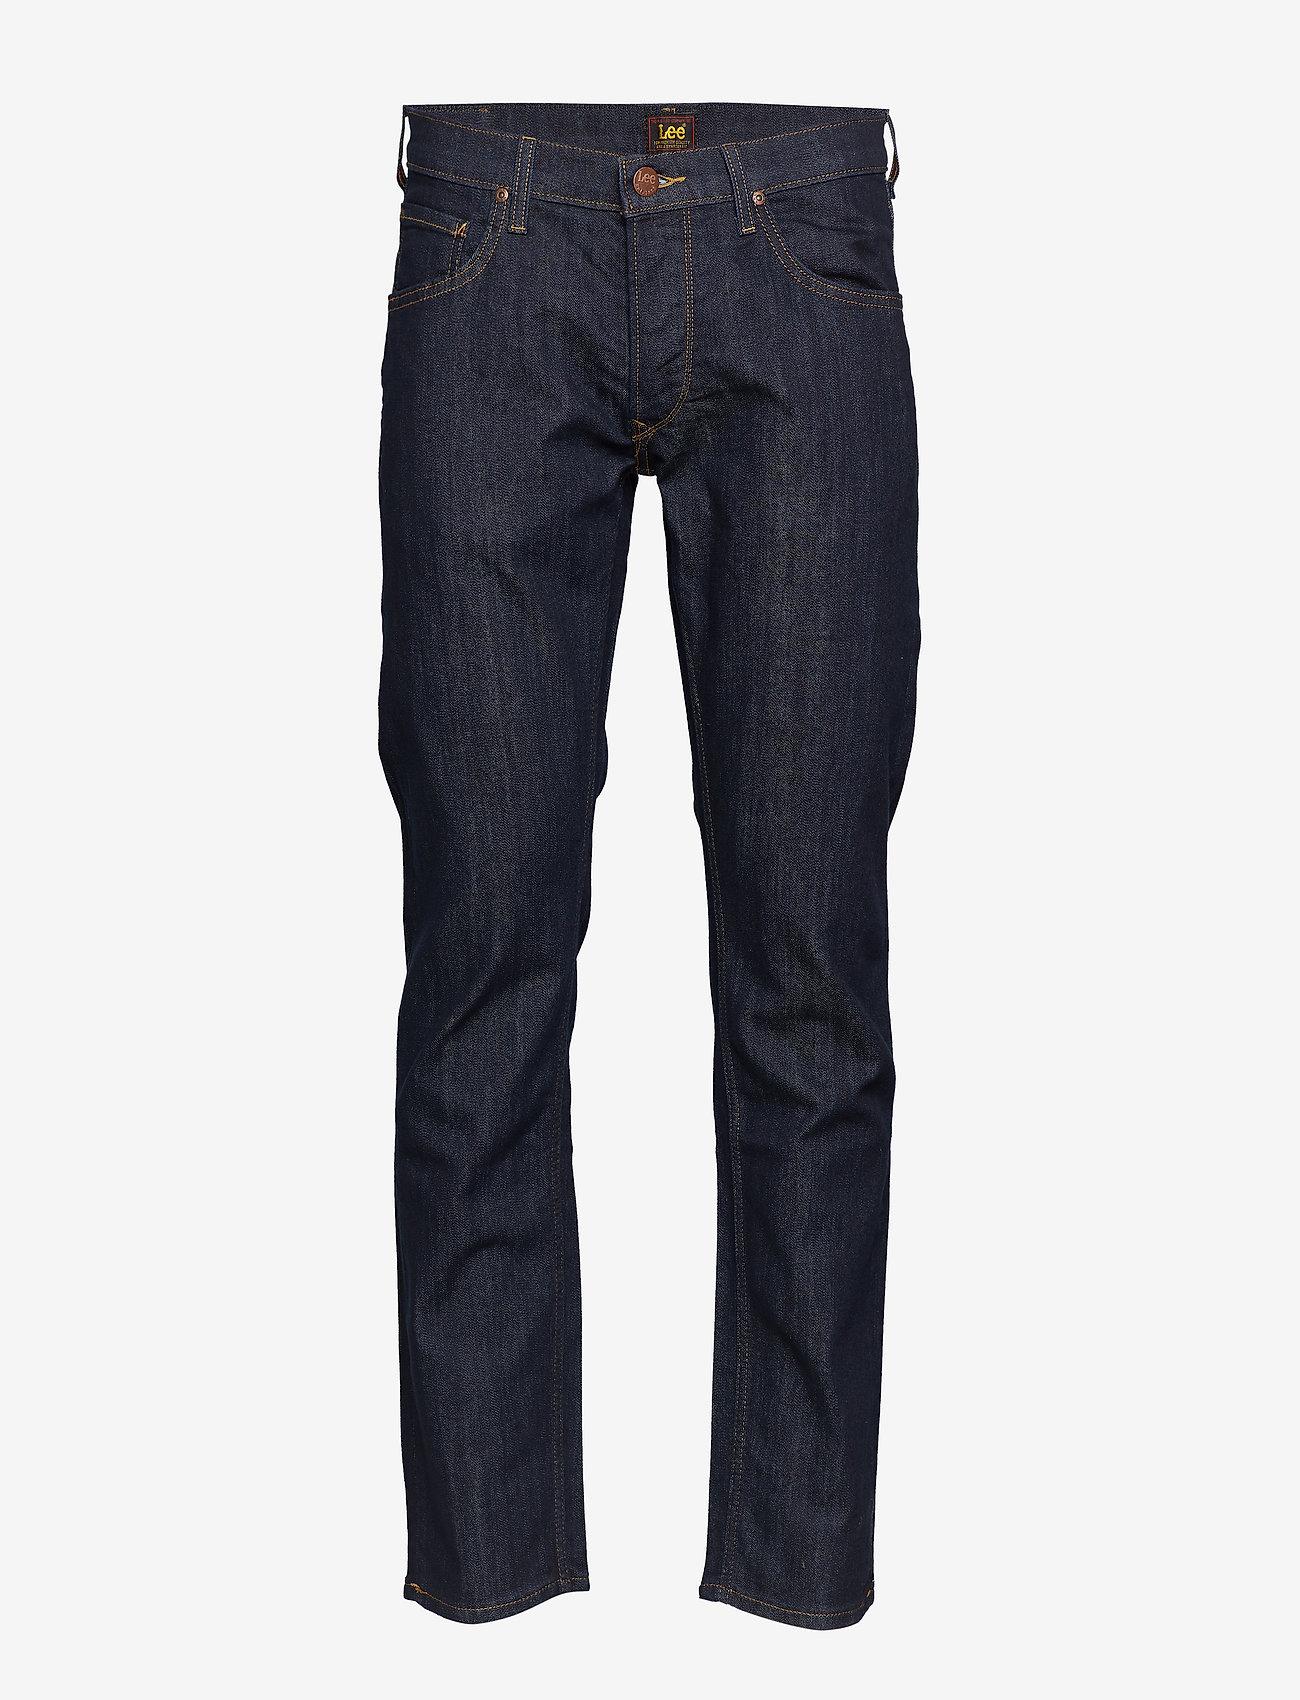 Lee Jeans - DAREN RINSE - regular jeans - rinse